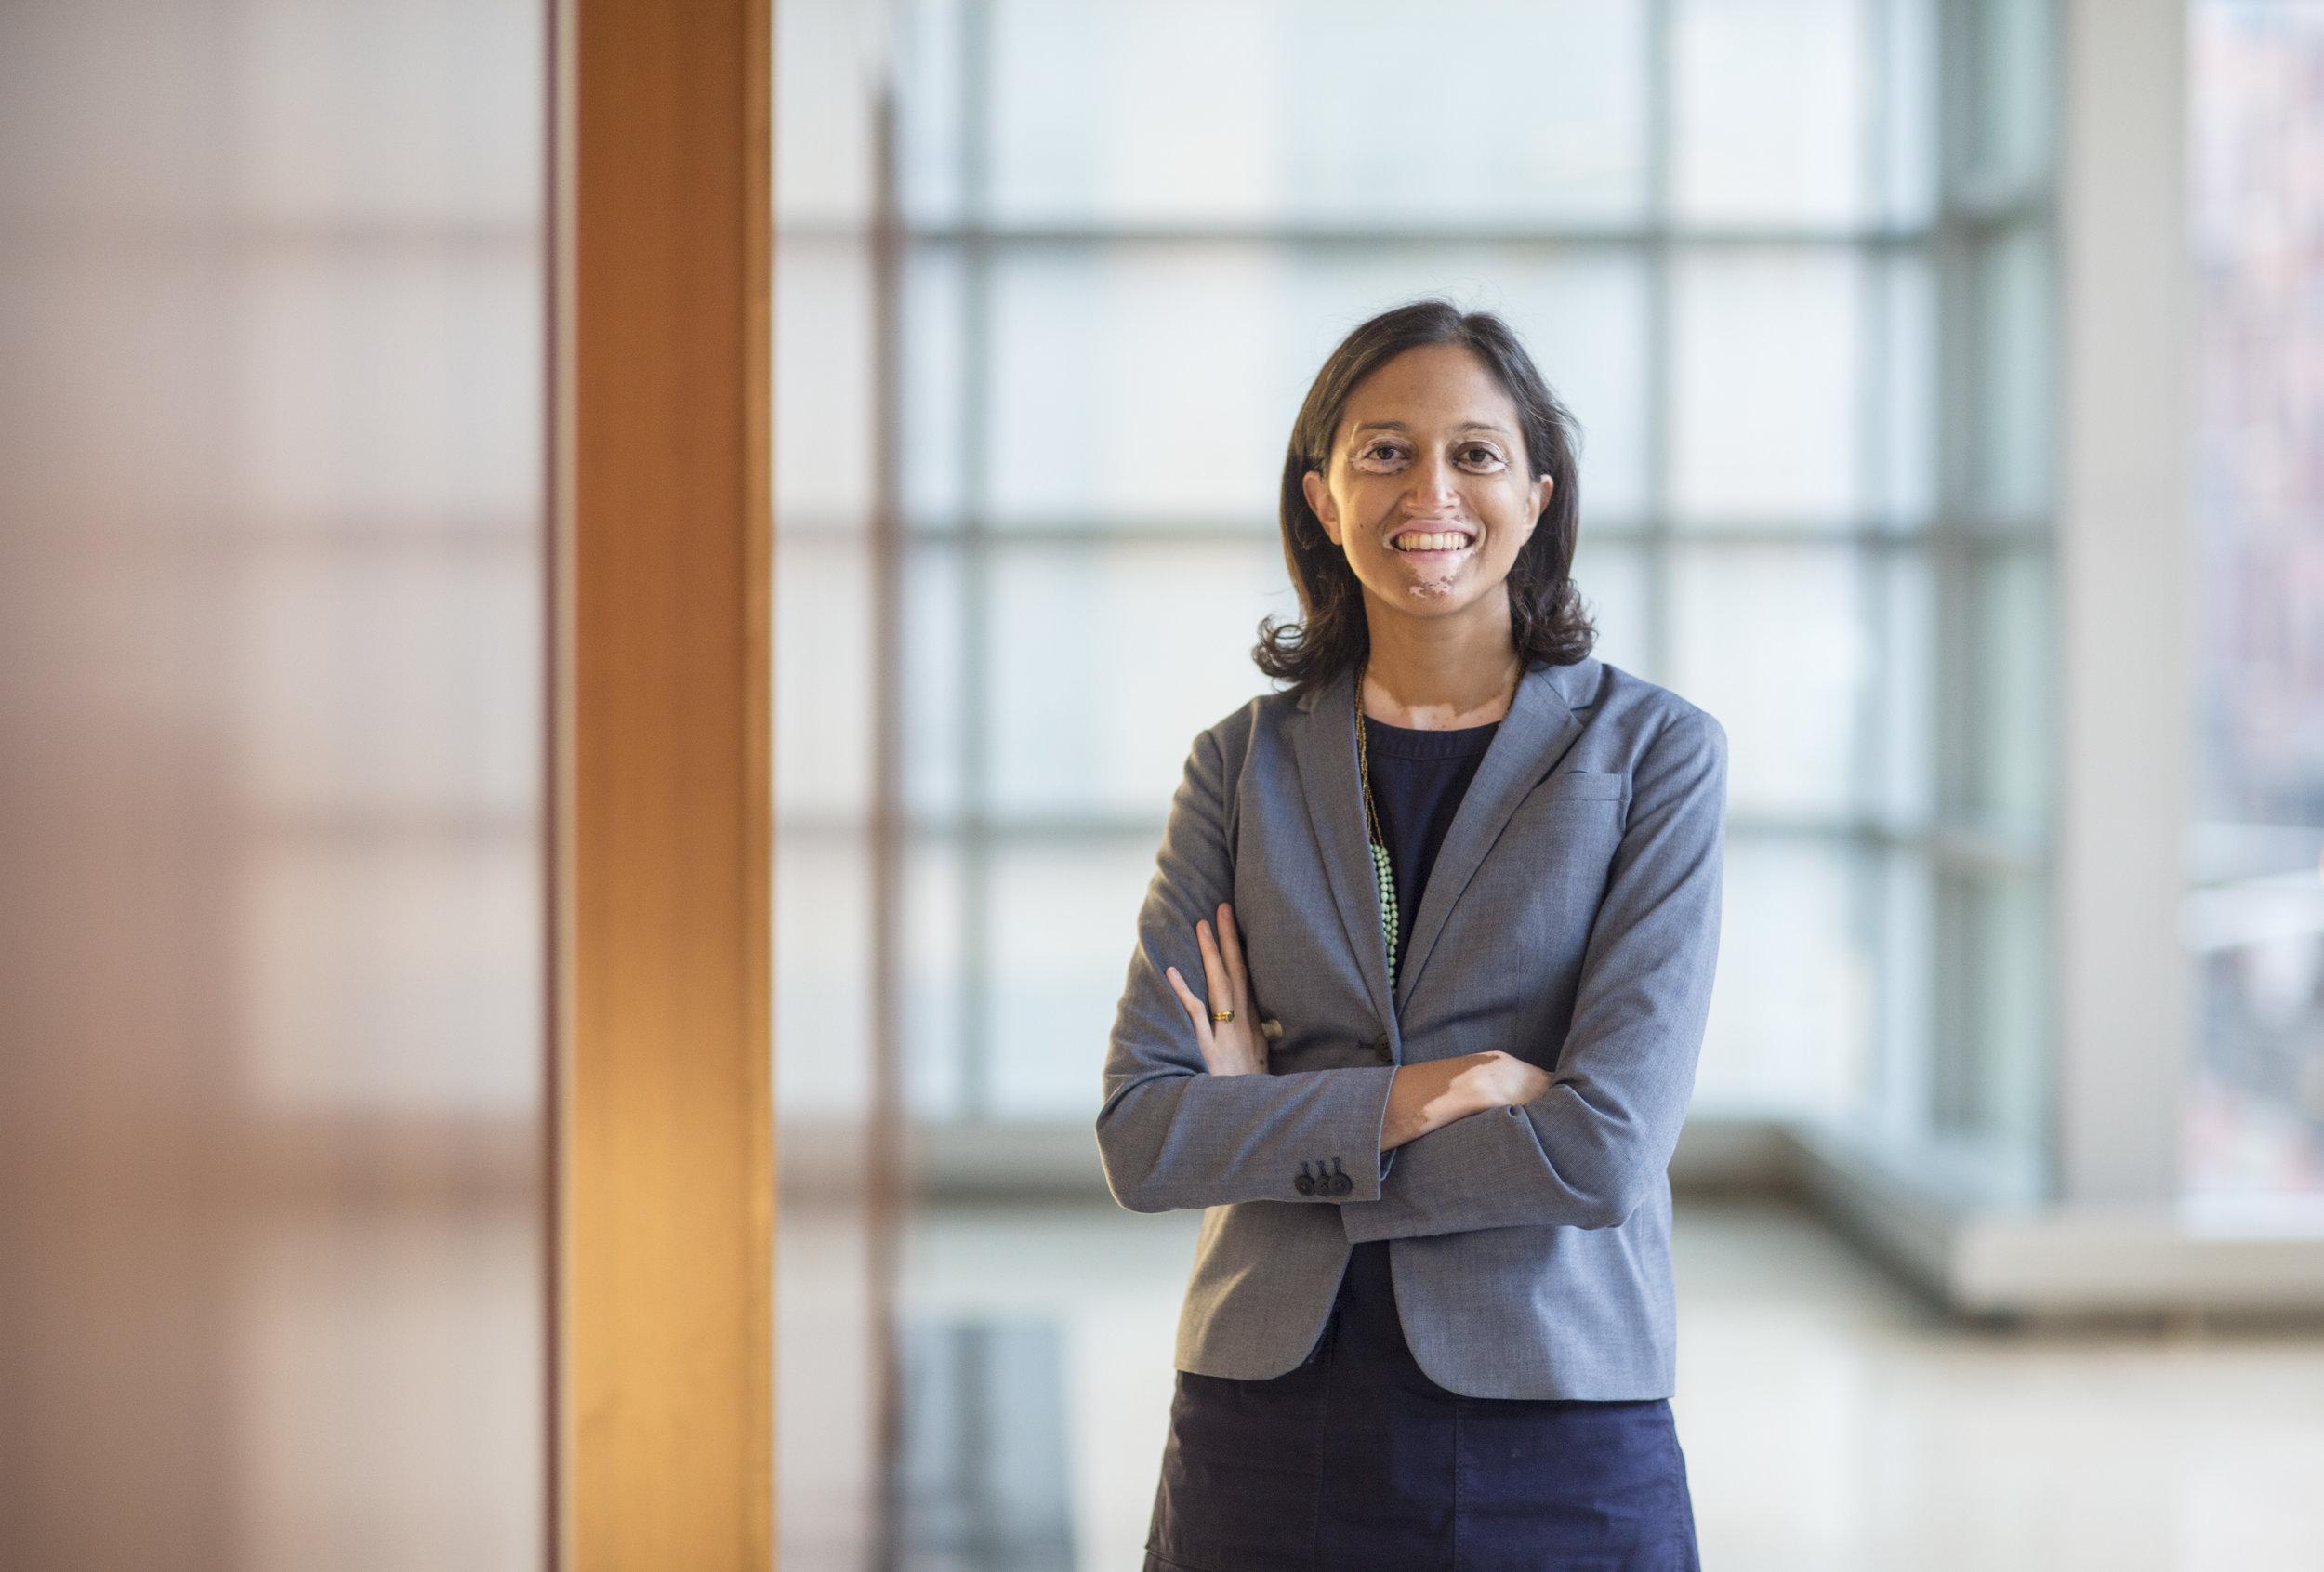 Swati Parikh, New York Law School's first executive director of public service and pro bono initiatives.